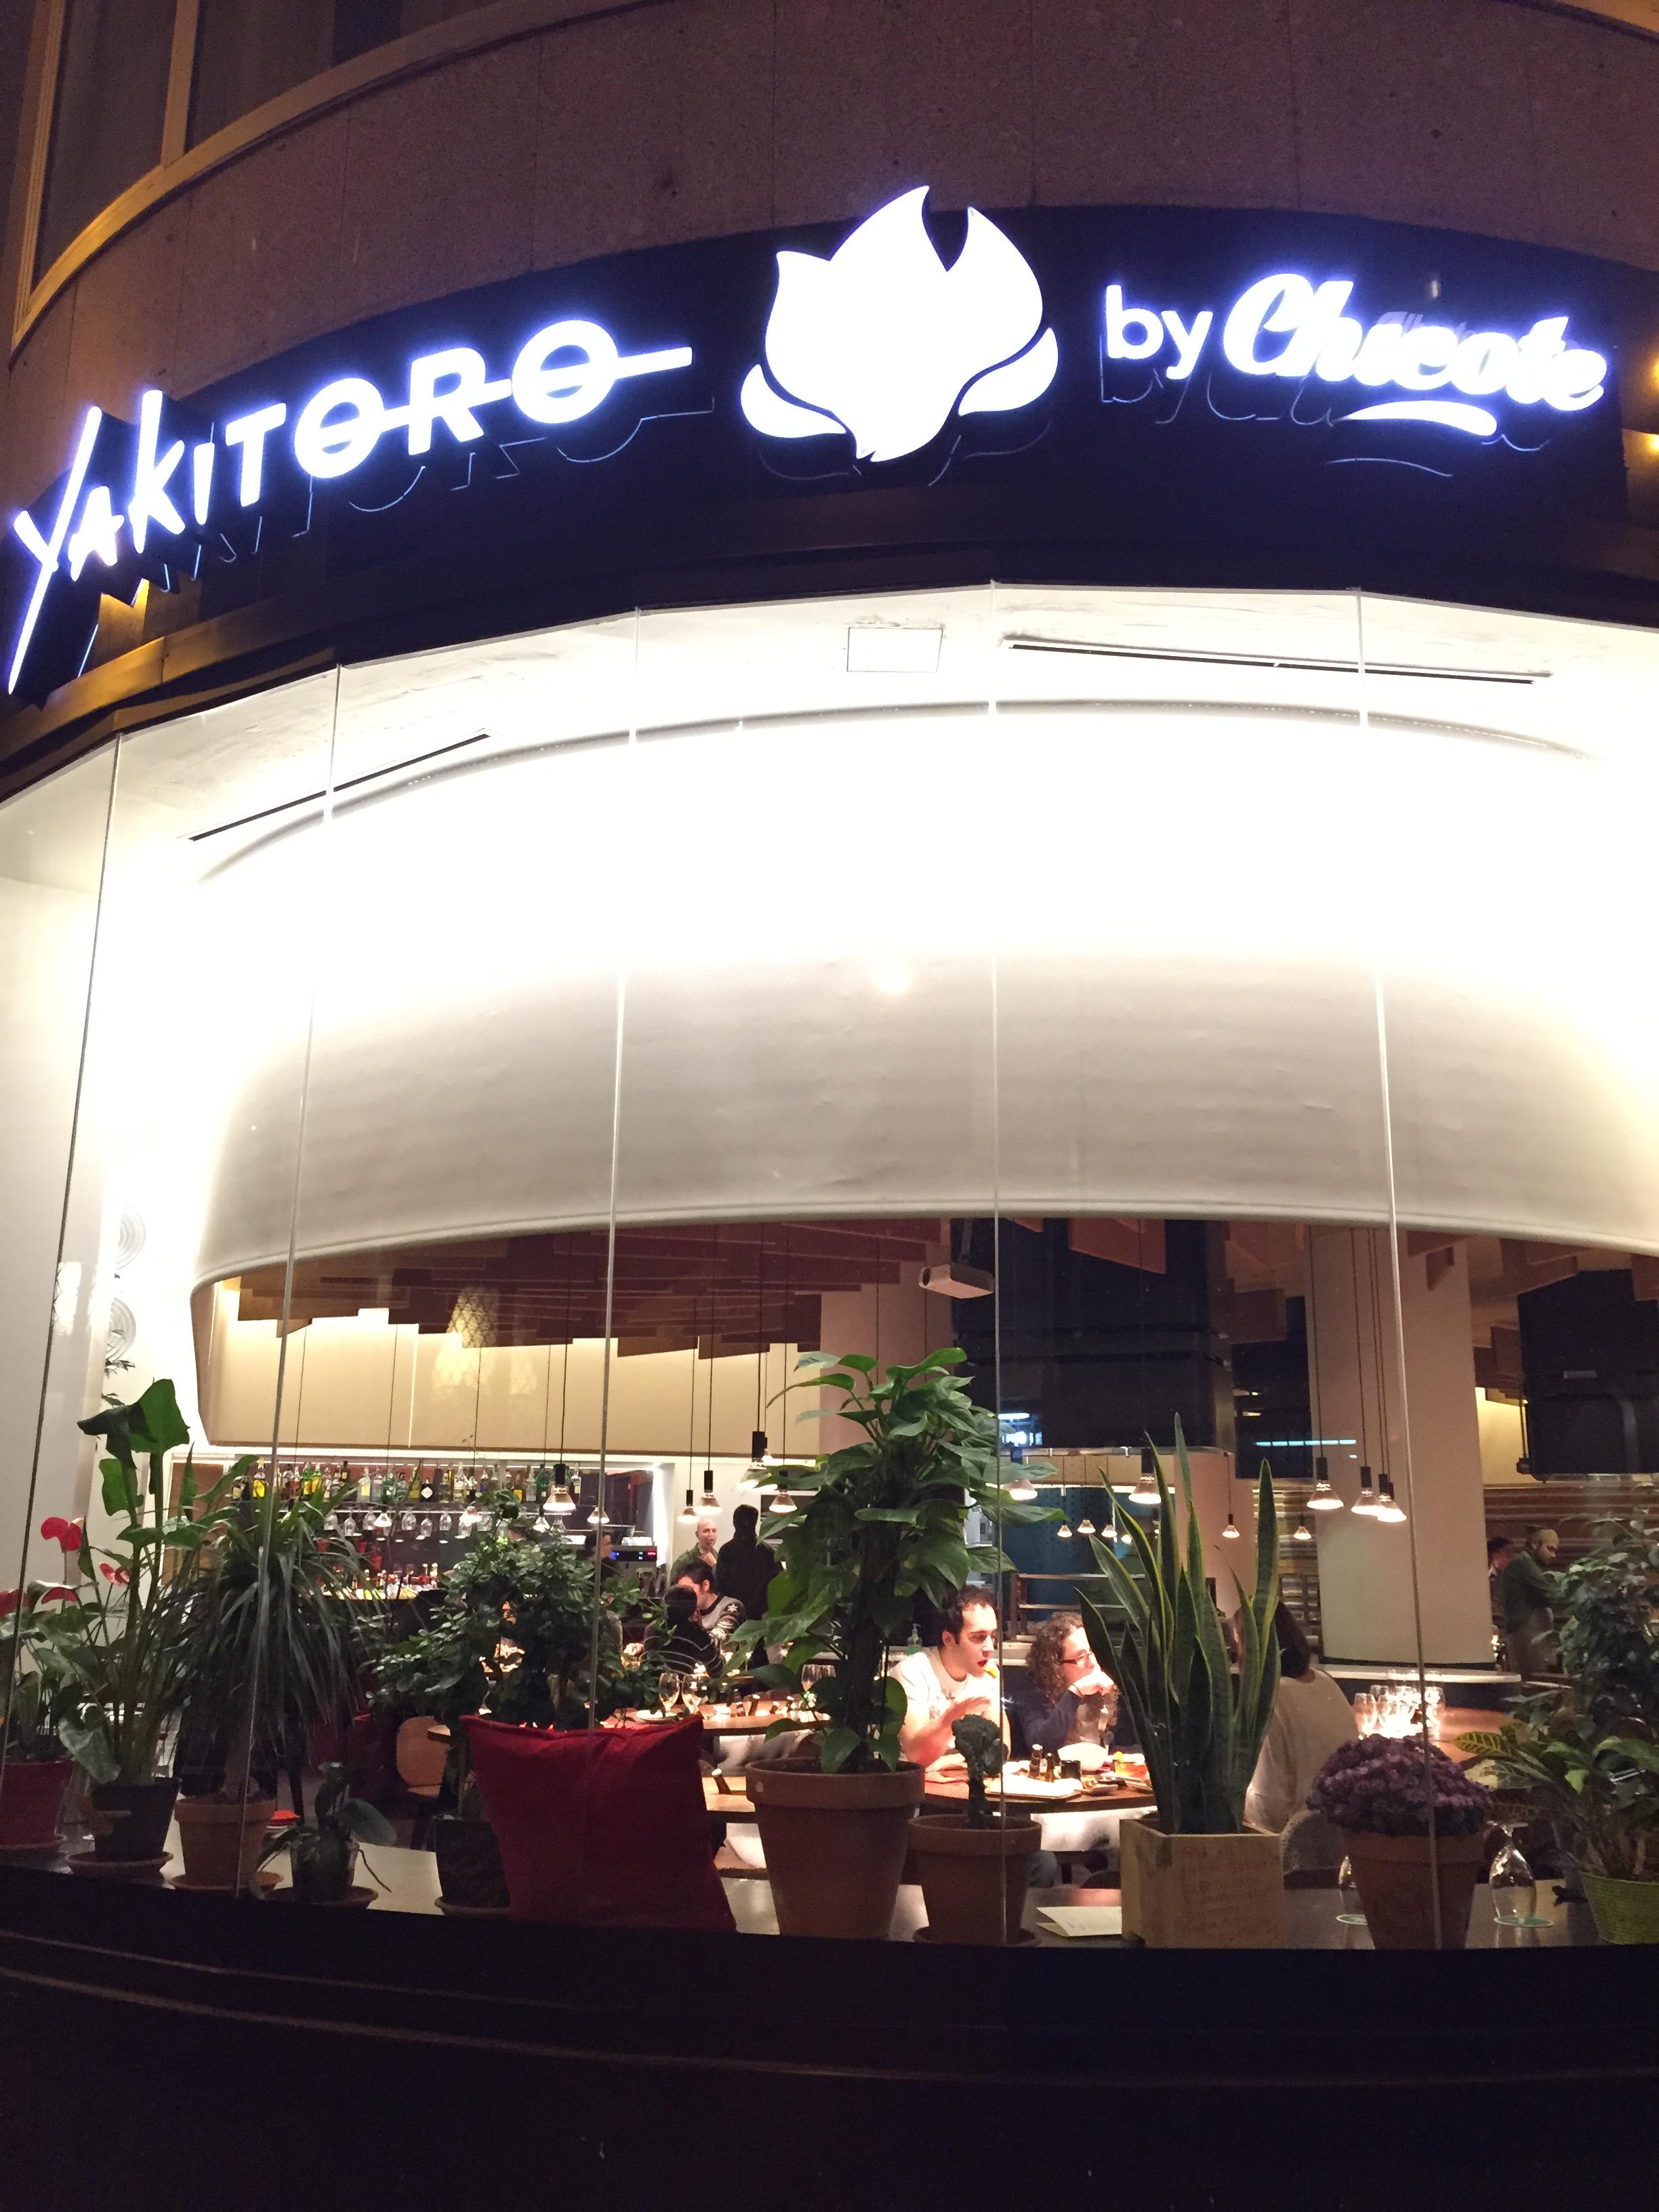 Yakitoro by chicote dime un restaurante - Restaurante singapur valencia ...